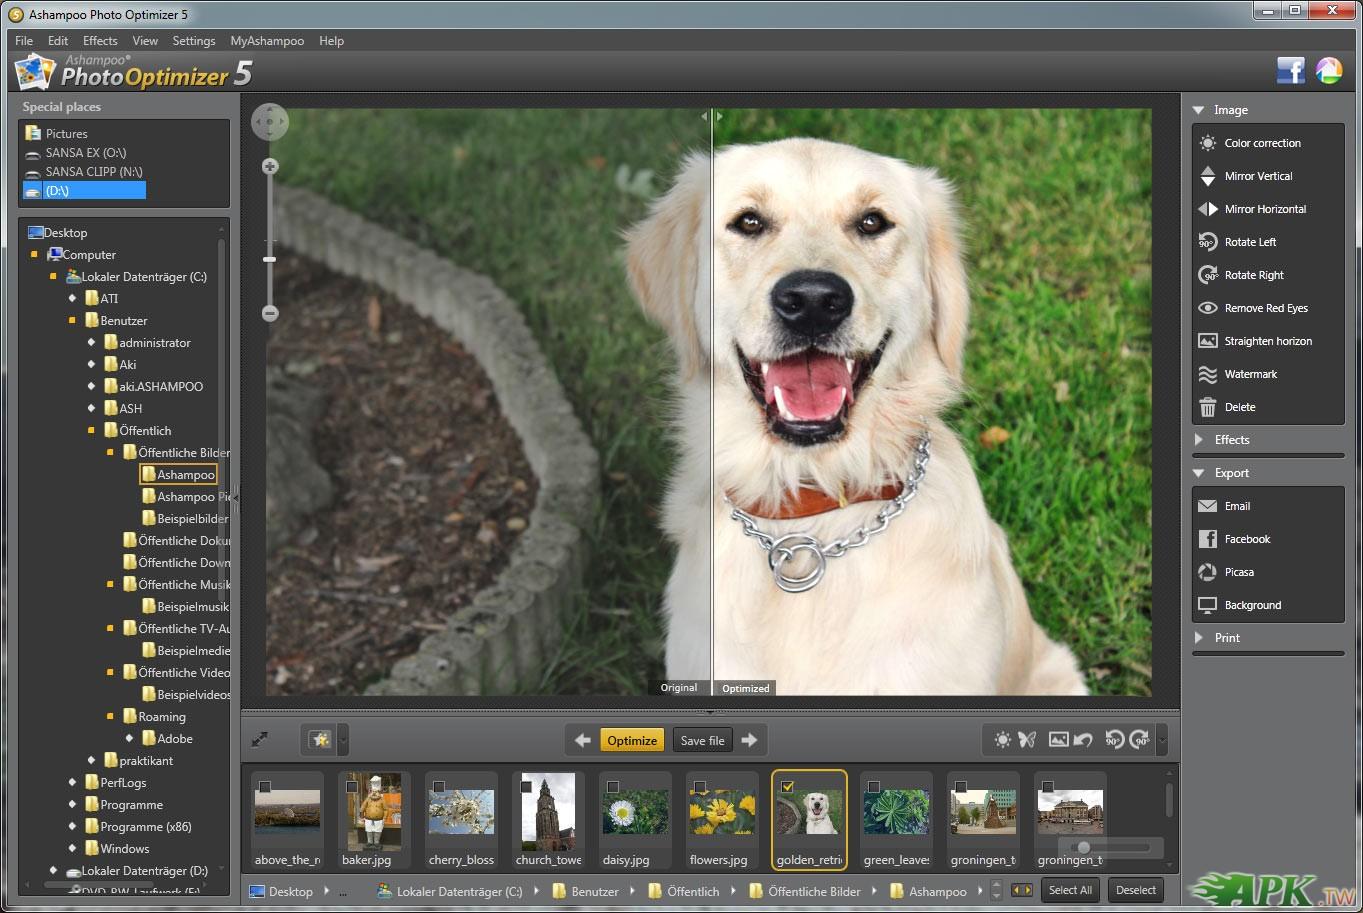 scr_ashampoo_photo_optimizer_5_en_optimize.jpg